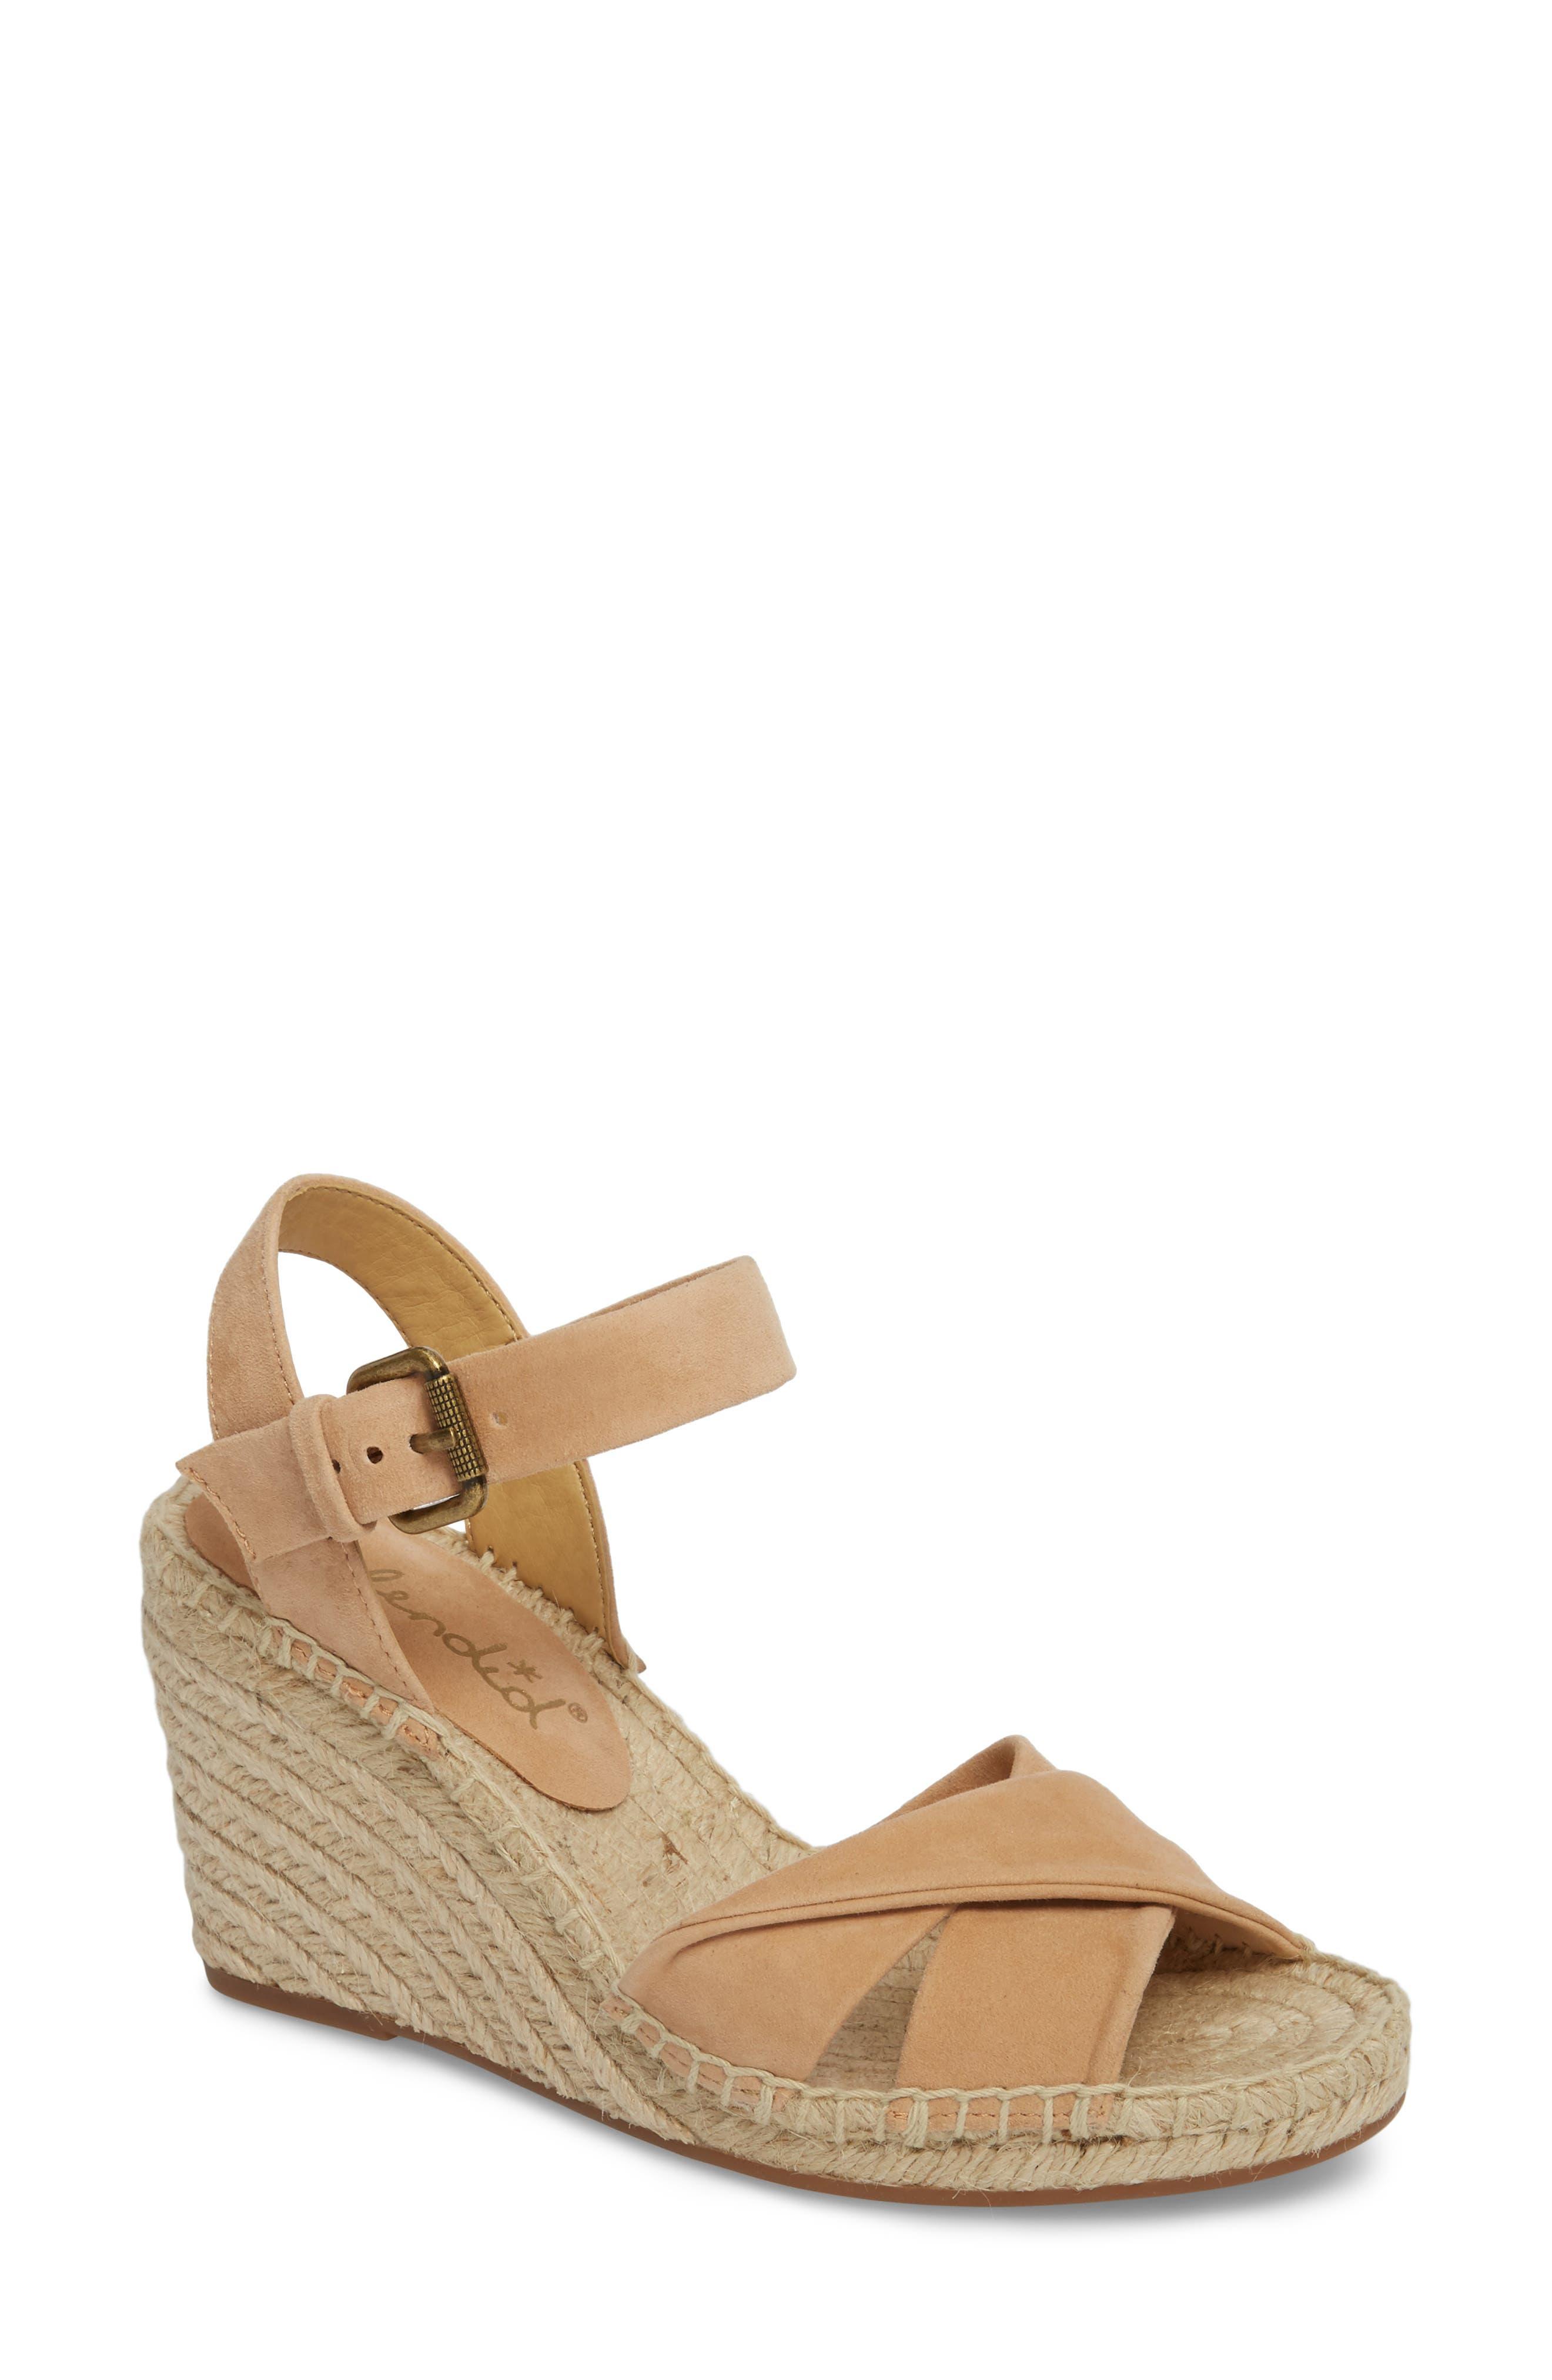 Sandals for Women On Sale, Blue, Sponge, 2017, 2.5 3 3.5 4 4.5 5 5.5 6 6.5 7.5 Miu Miu